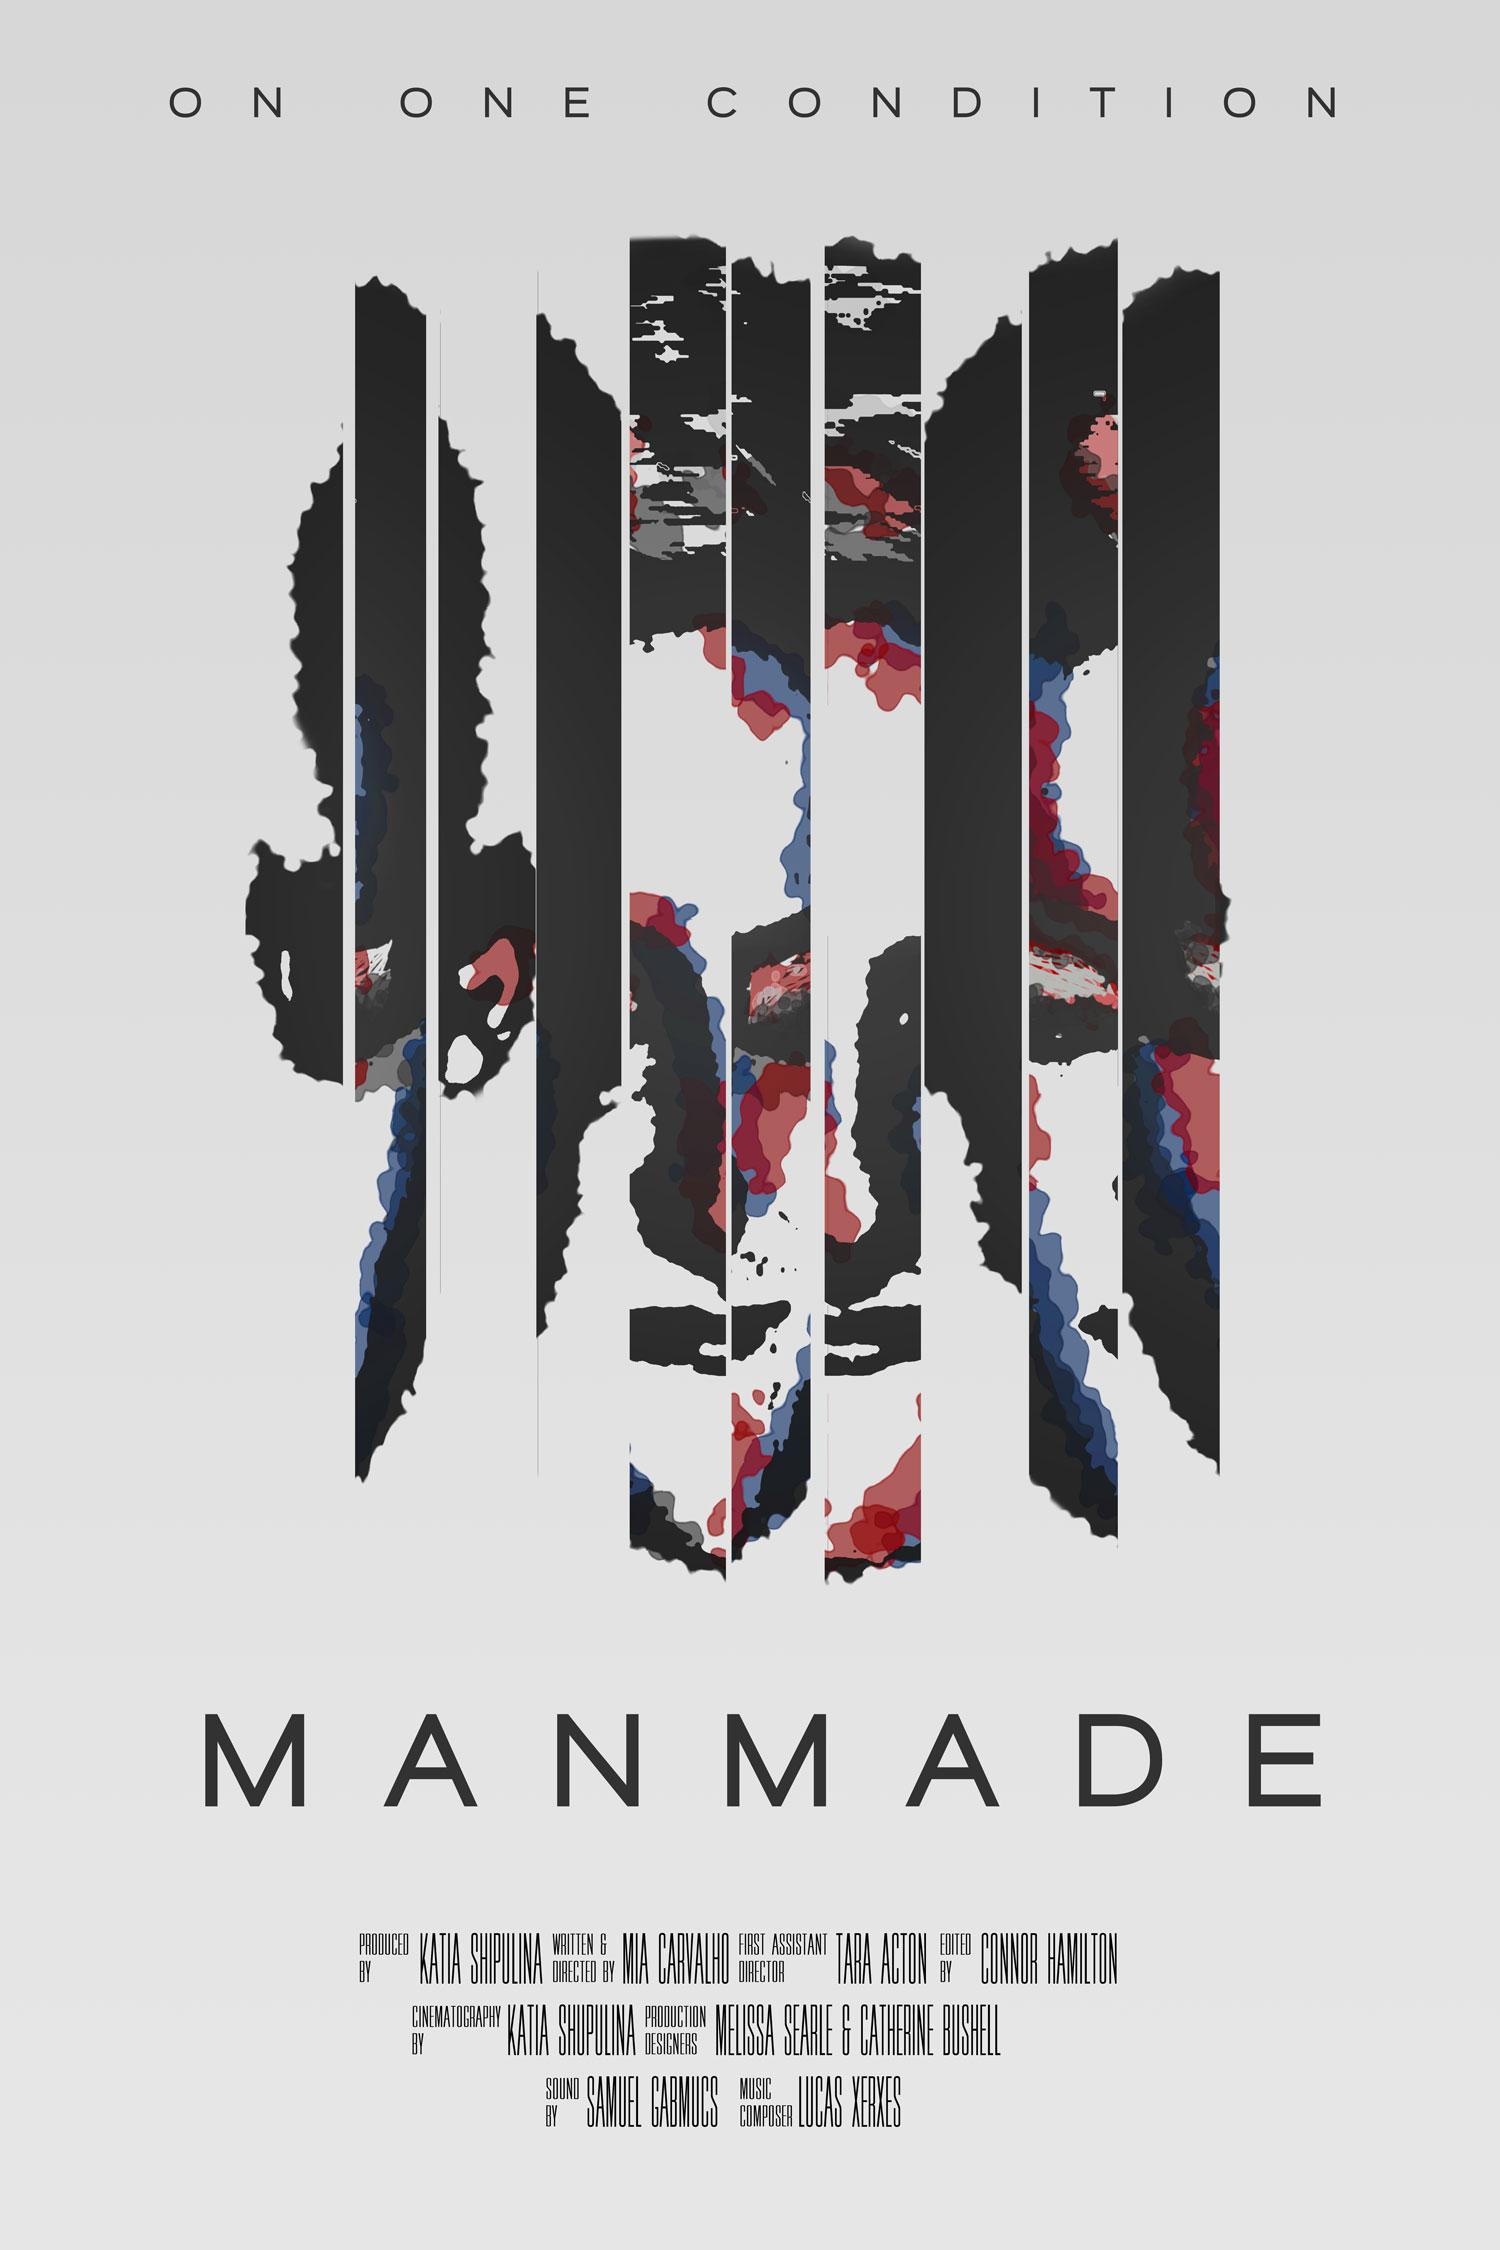 MANMADE_POSTER_Flattened3.jpg